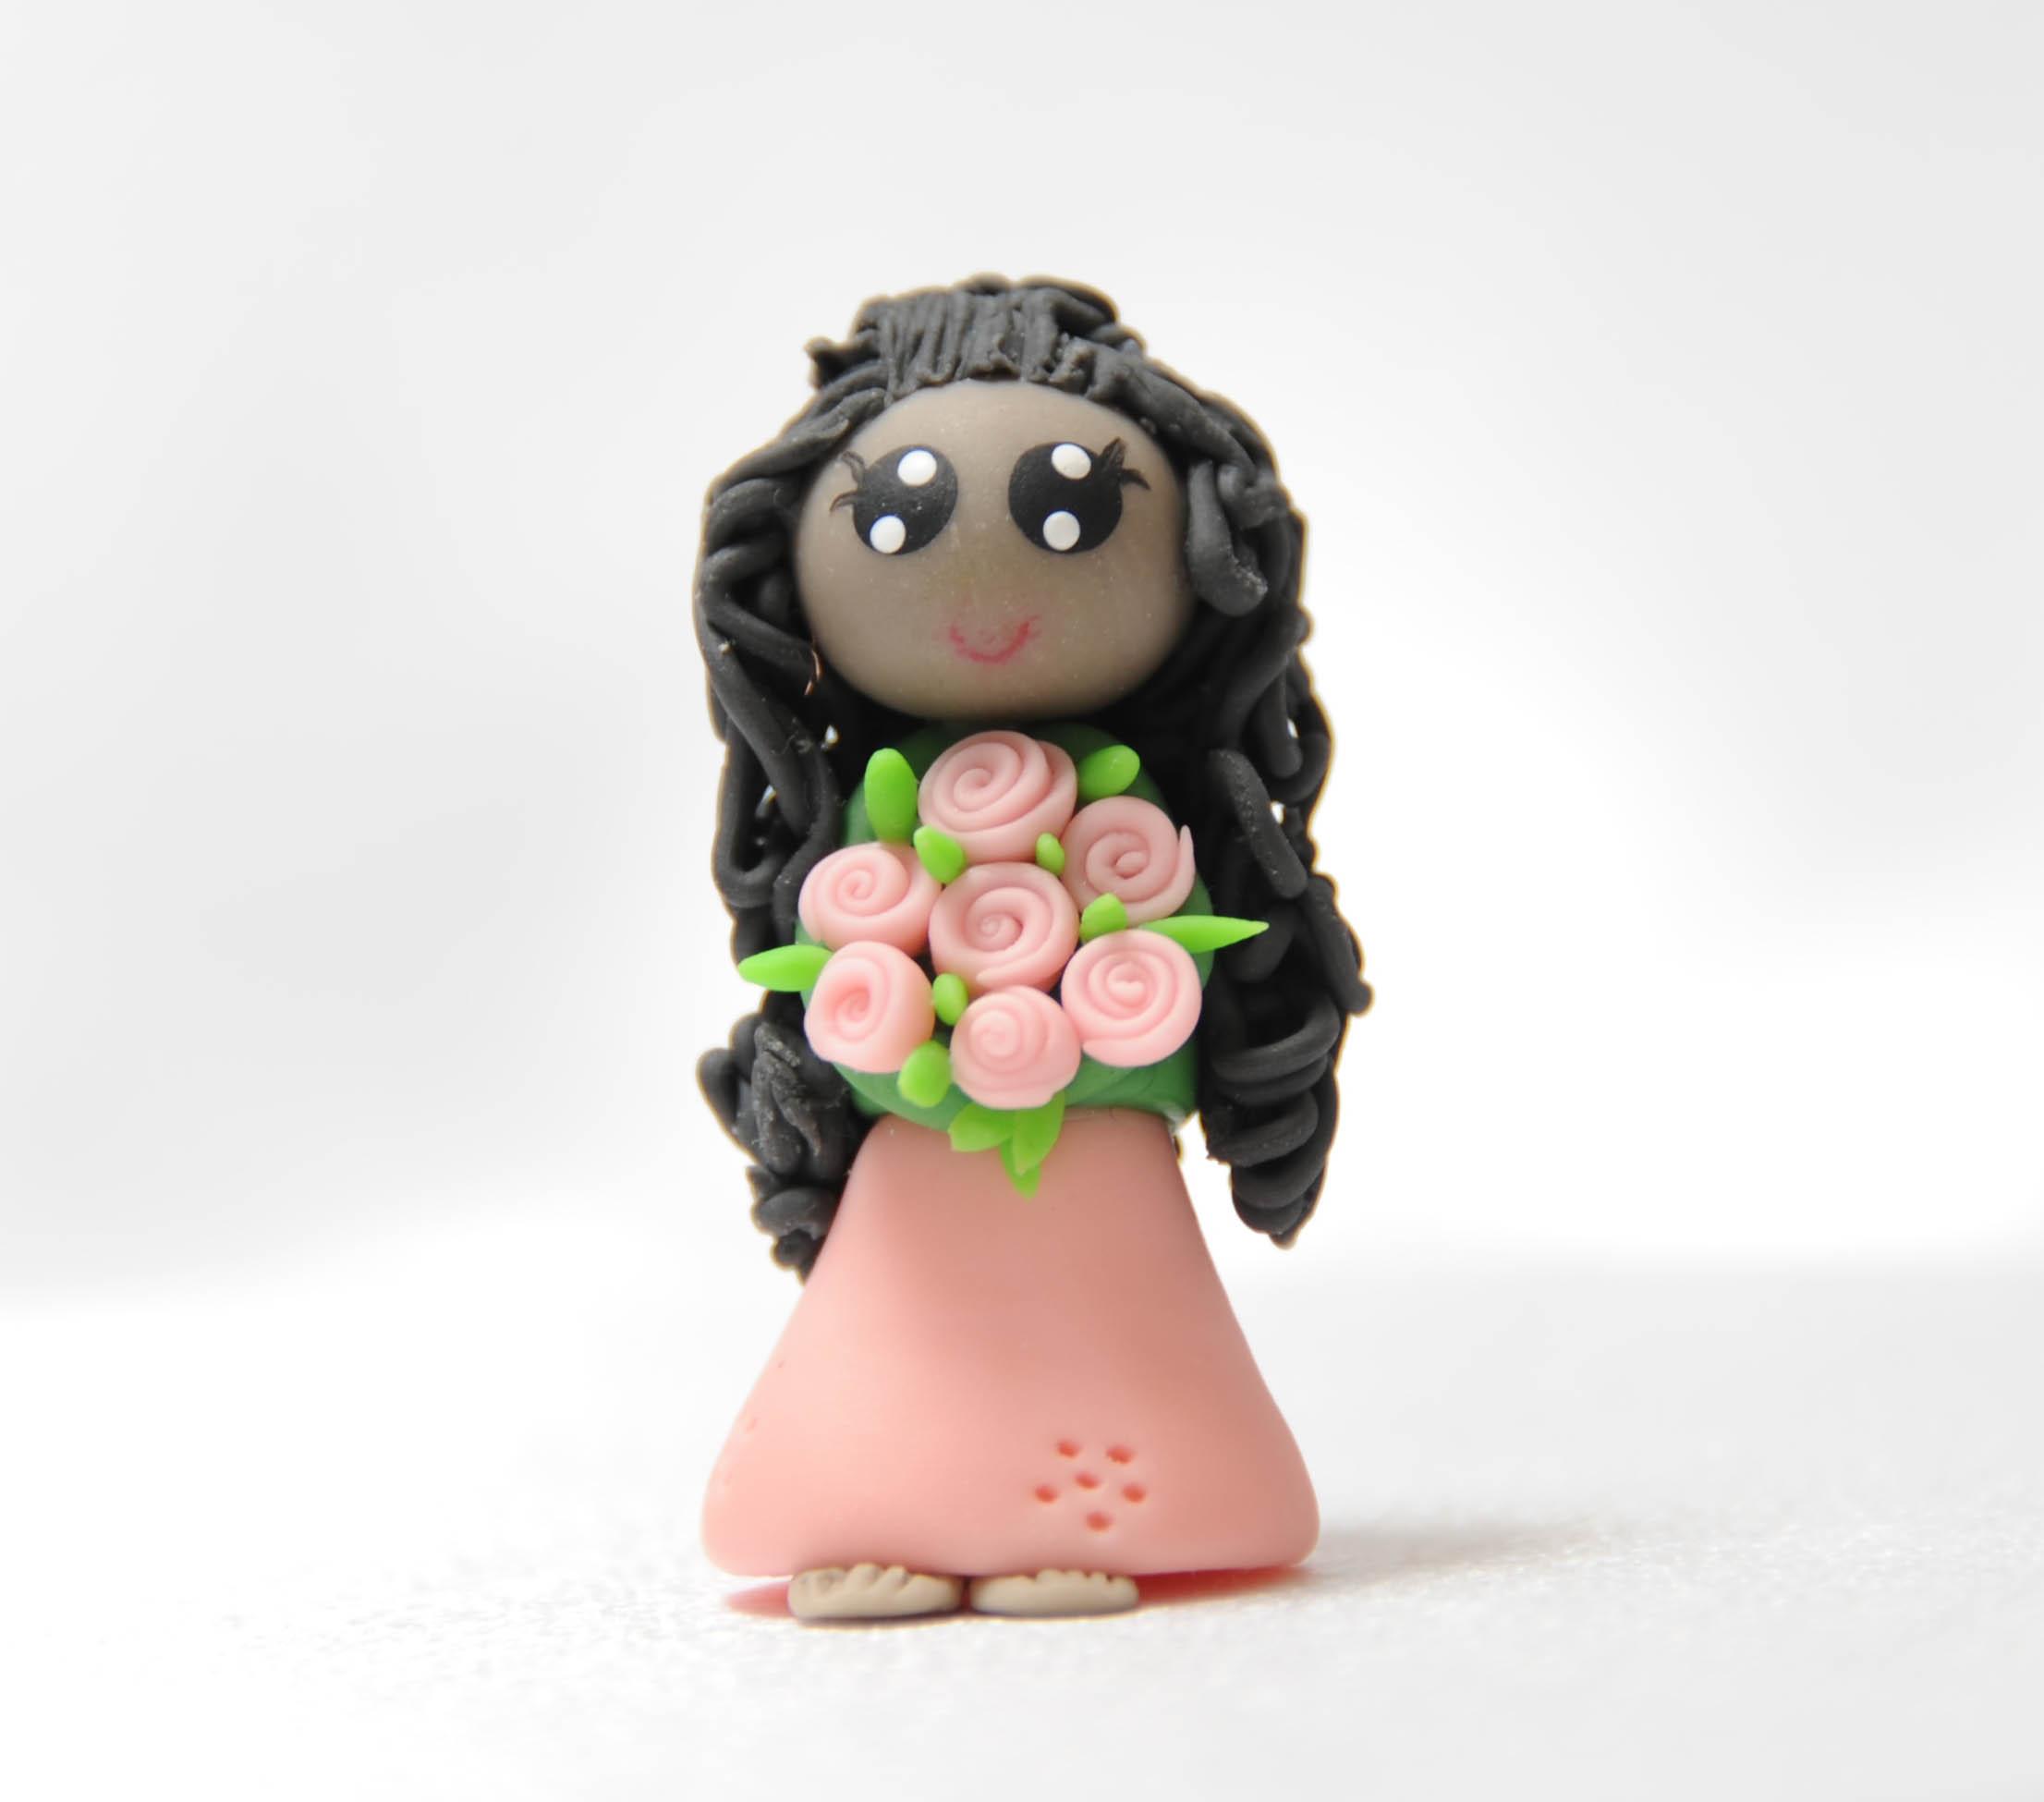 Lady in Pink Dress - Wavy Hair